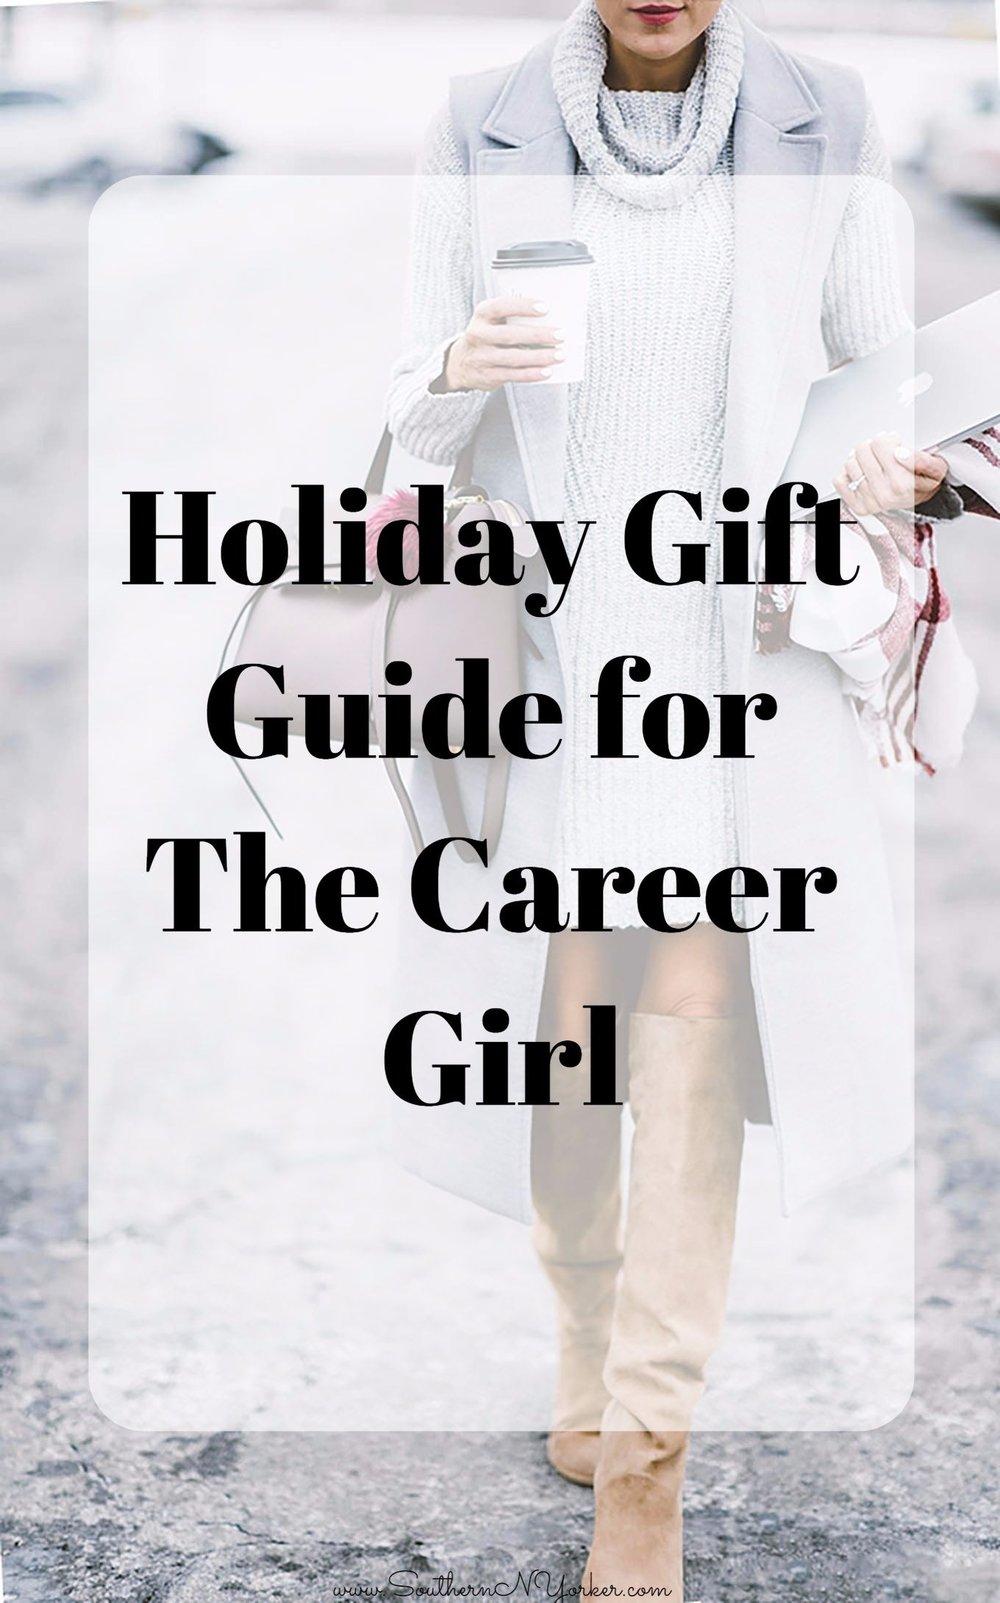 holiday gift guide for the career girl. christmas gift ideas for the girlboss